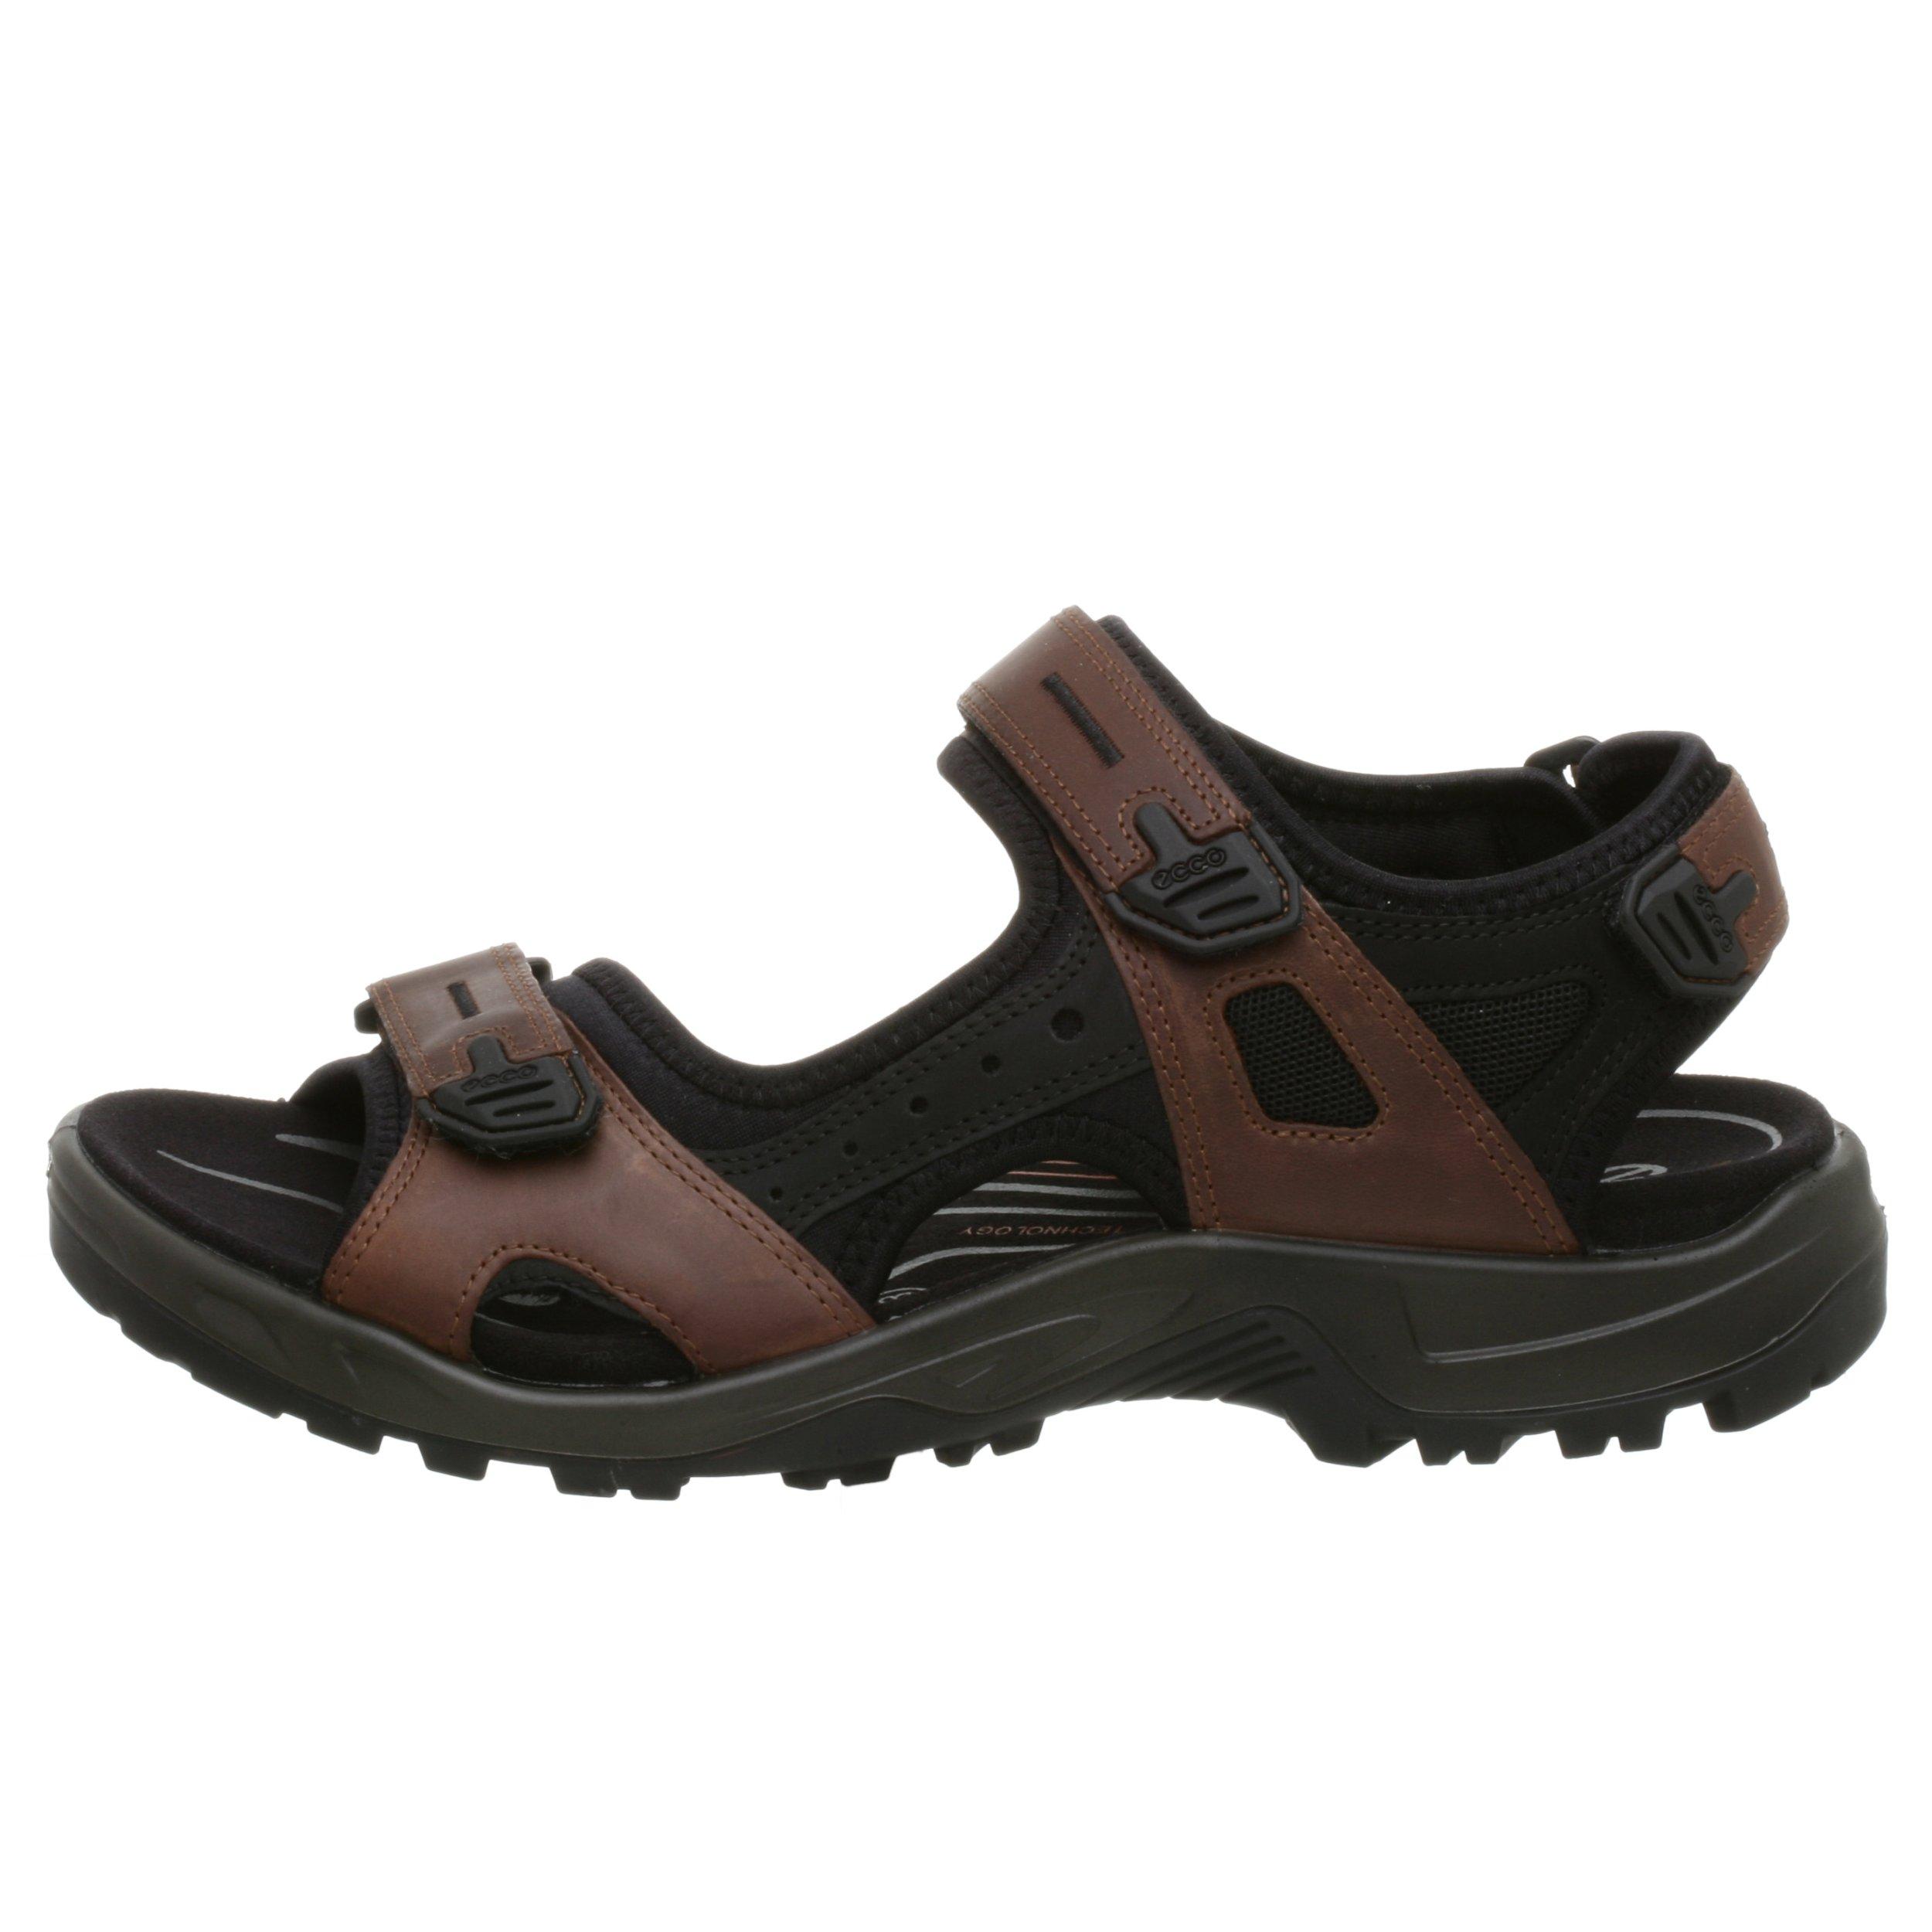 ECCO Men's Yucatan Sandal,Bison/Black/Black,44 EU (US Men's 10-10.5 M) by ECCO (Image #5)